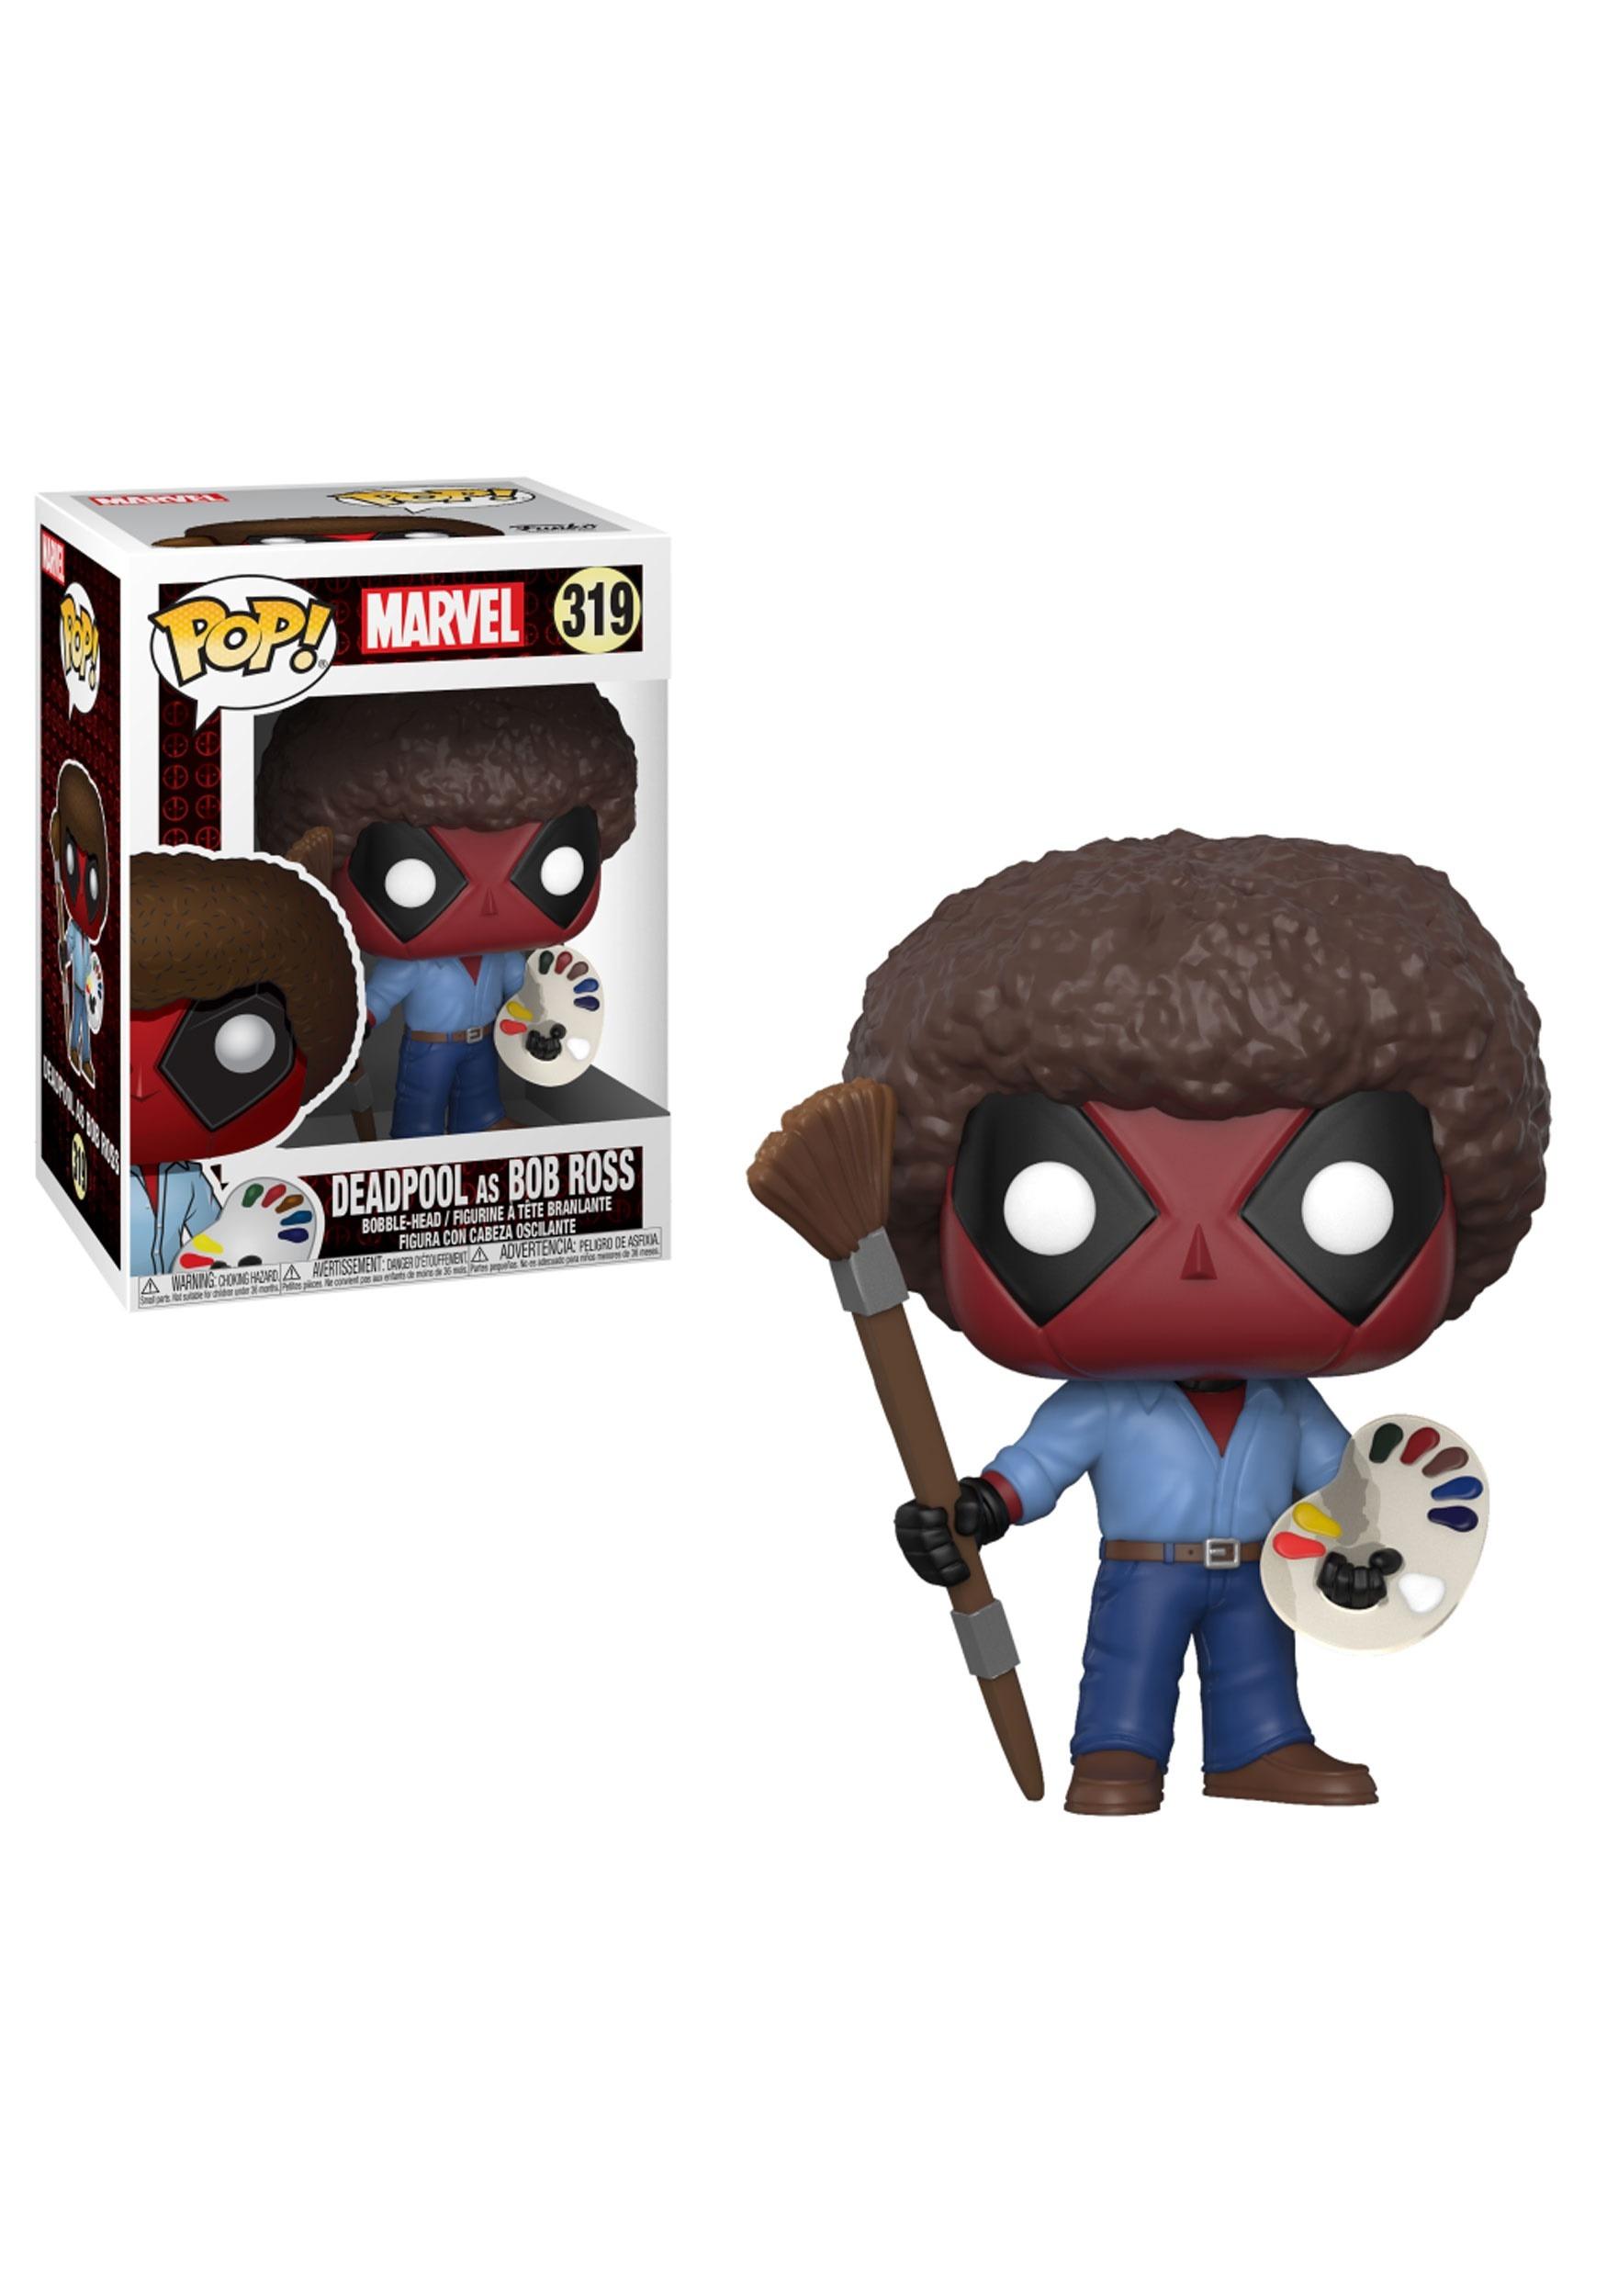 Marvel Deadpool As Bob Ross Pop Bobblehead Figure